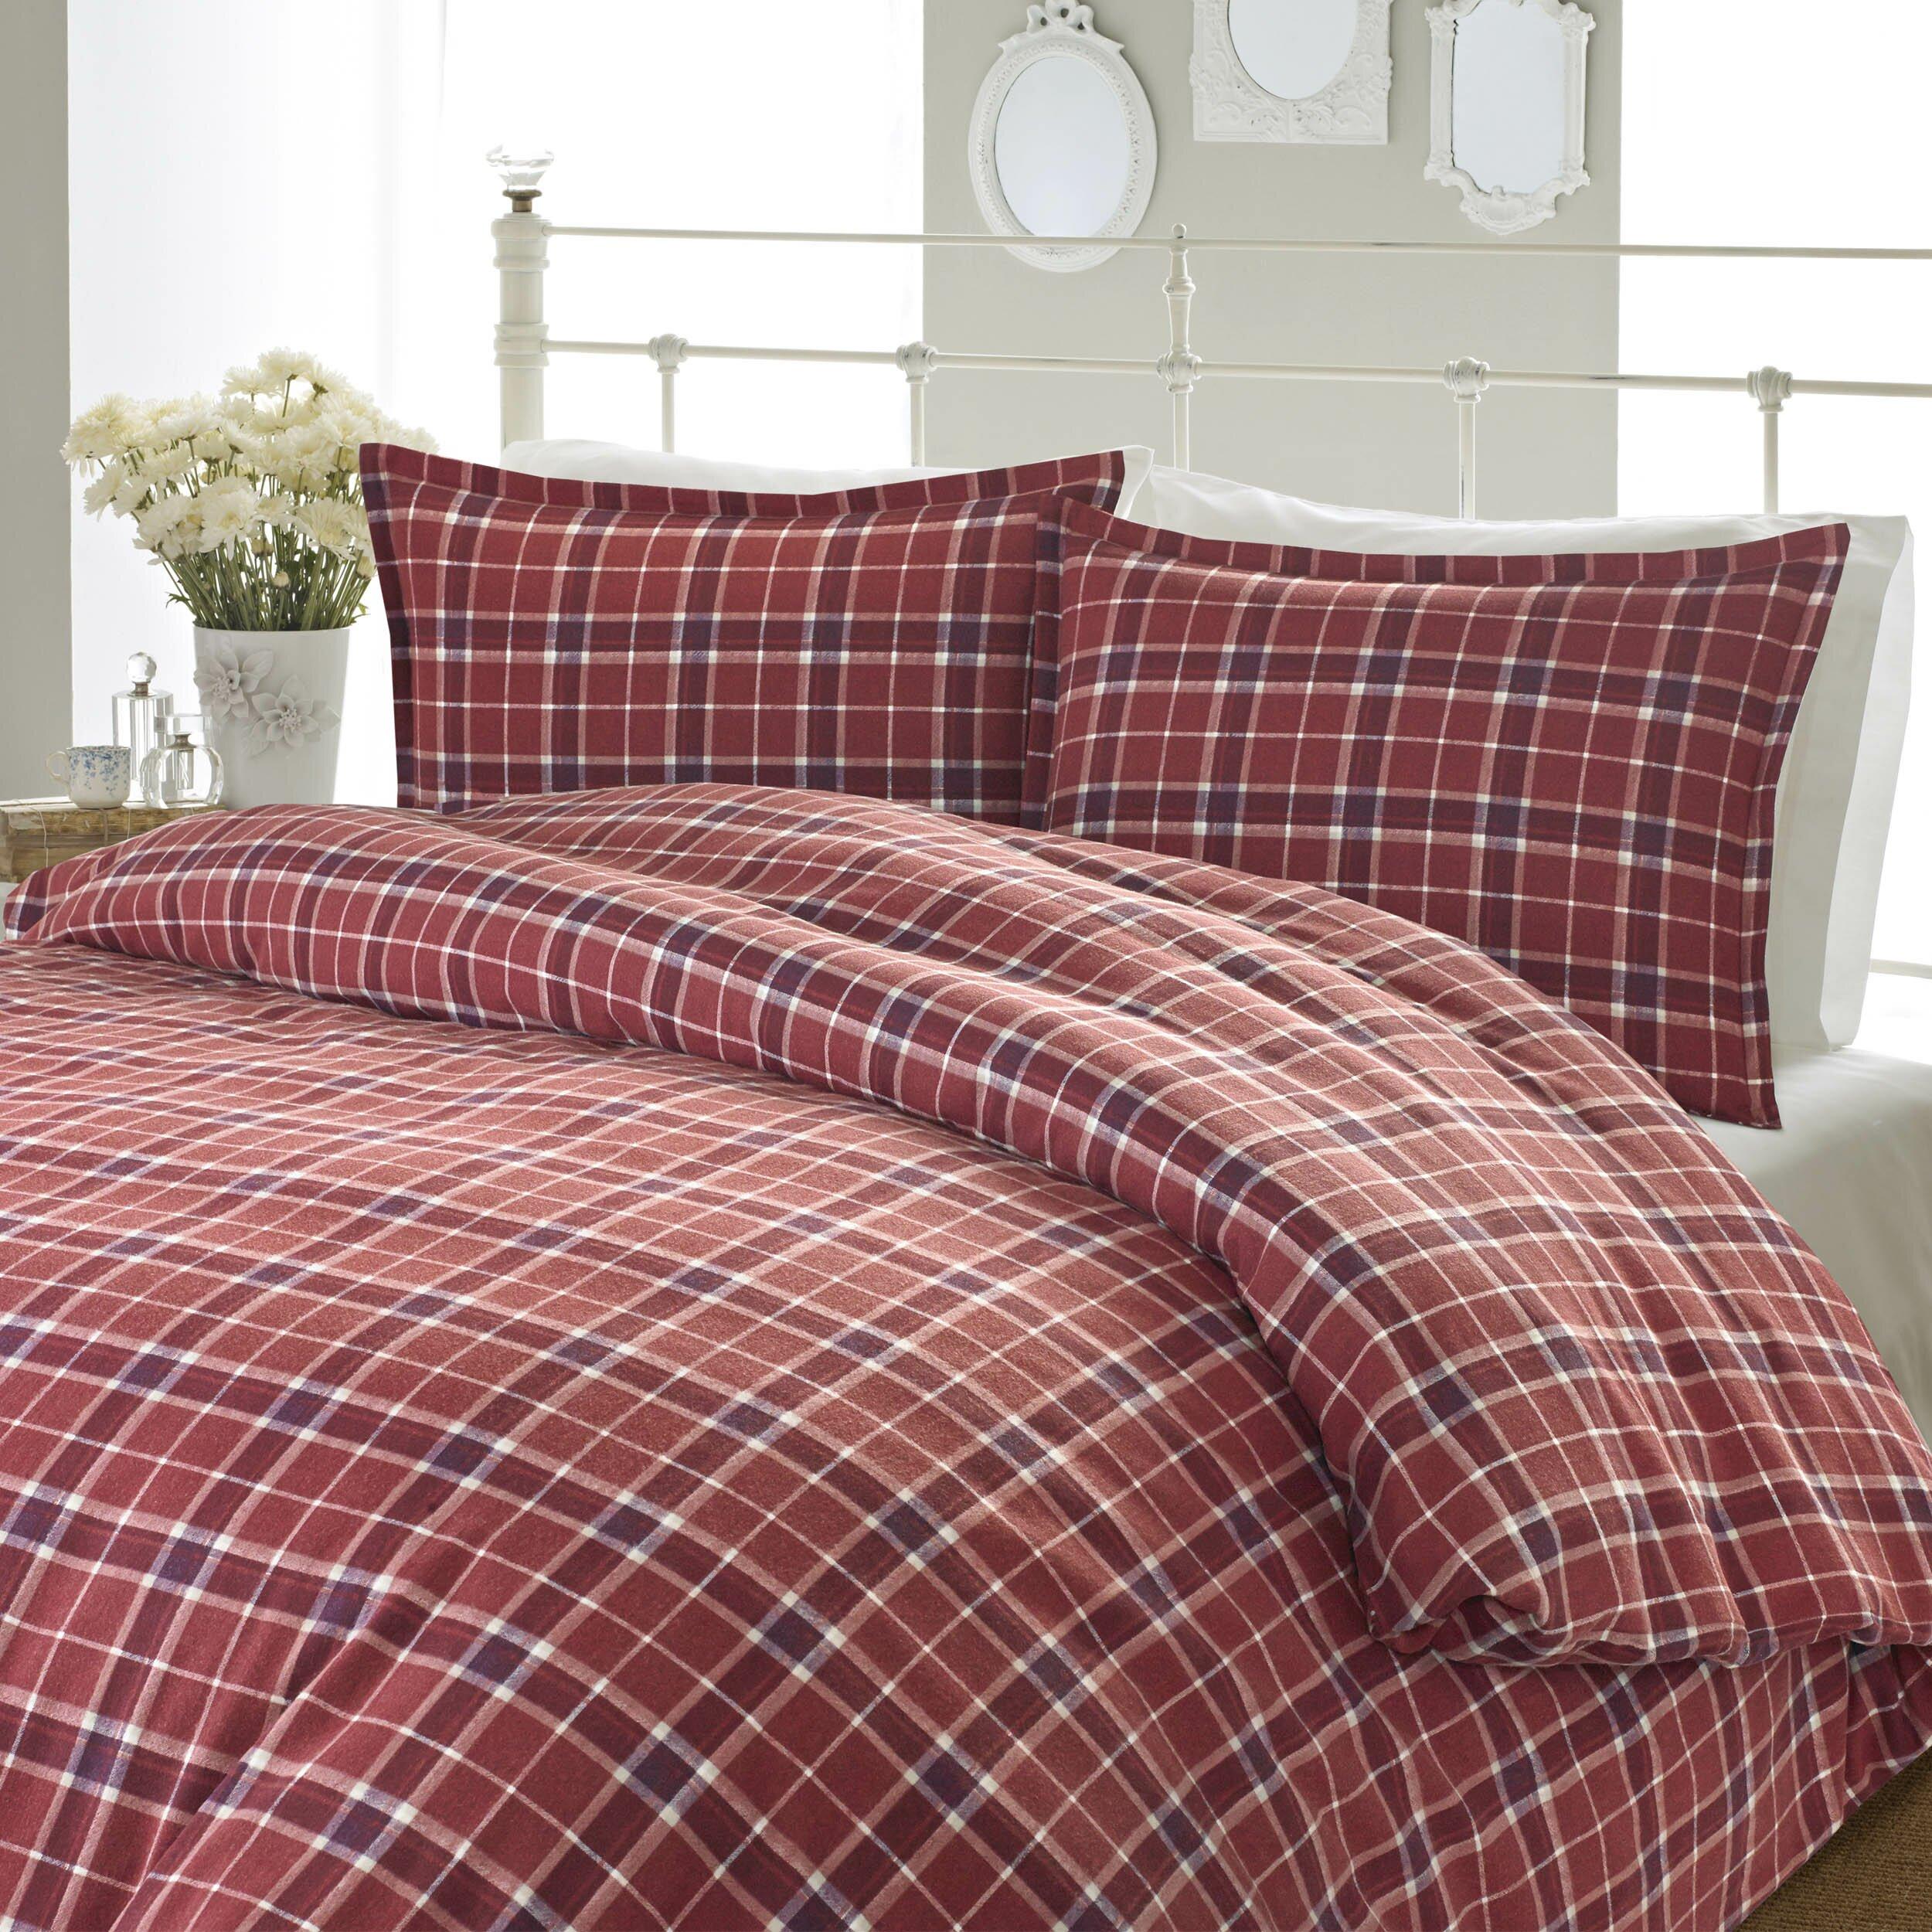 Laura Ashley Flannel Queen Sheet Set: Laura Ashley Home Highland Check Flannel Sheet Set